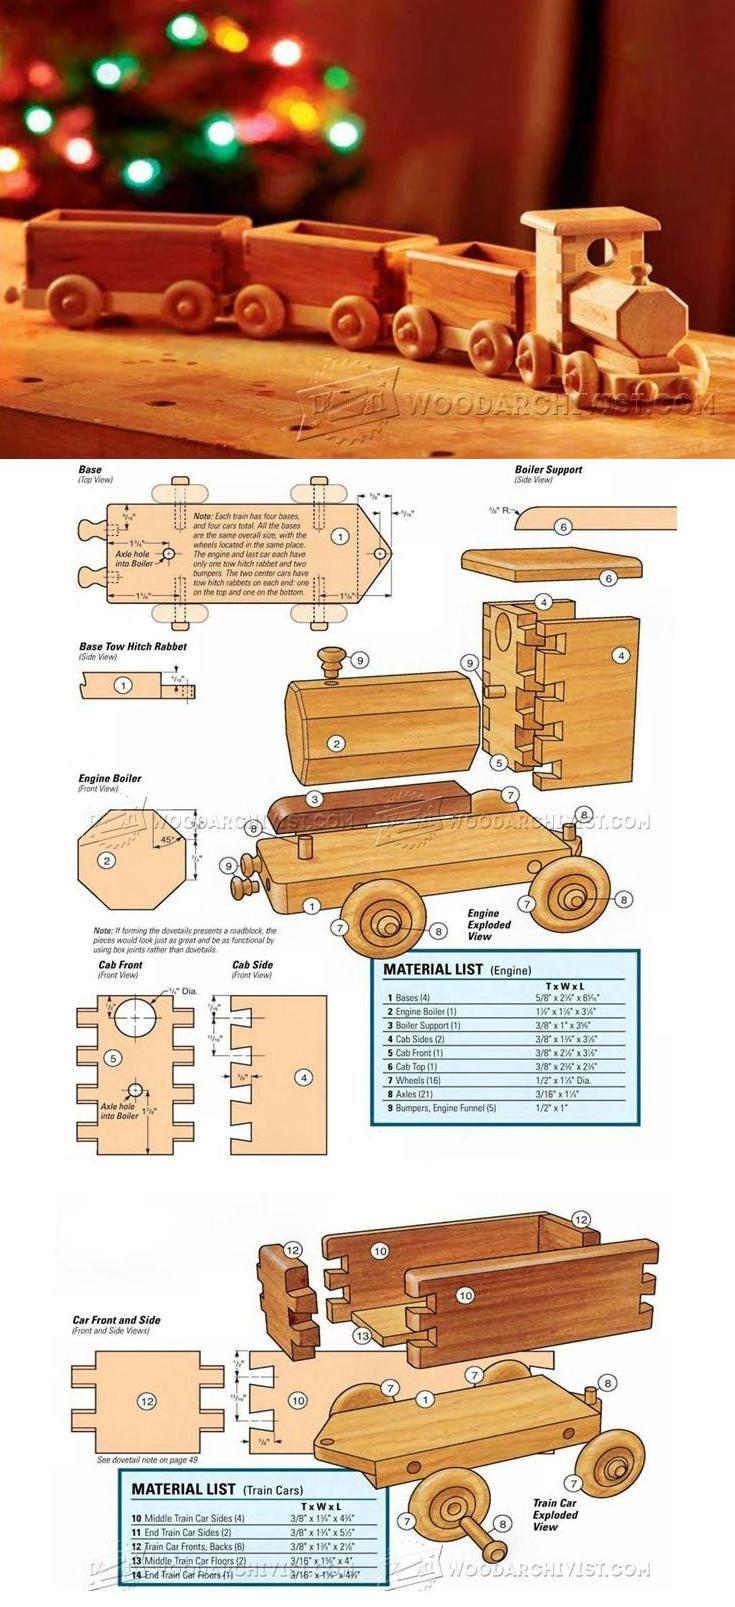 Wooden Train Plans - Children's Wooden Toy Plans and Projects   WoodArchivist.com